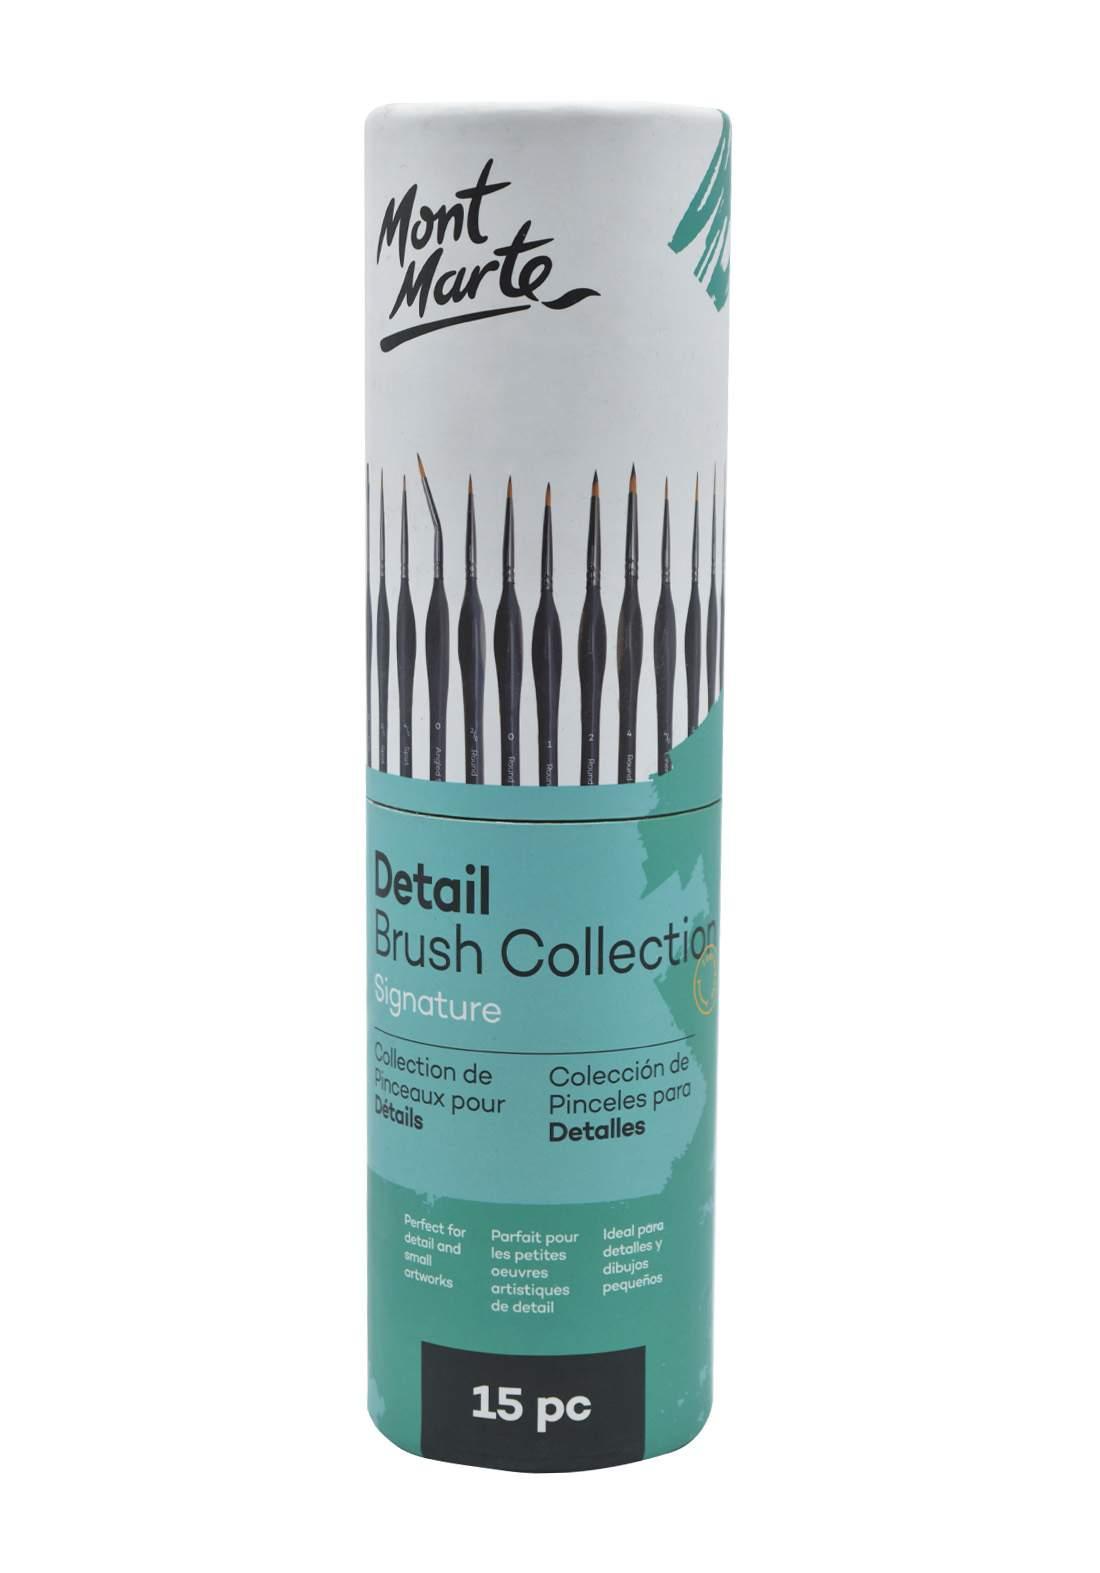 Mont Marte Signature Detail Brush Collection 15 Pcs  علبة فرش أكريليك